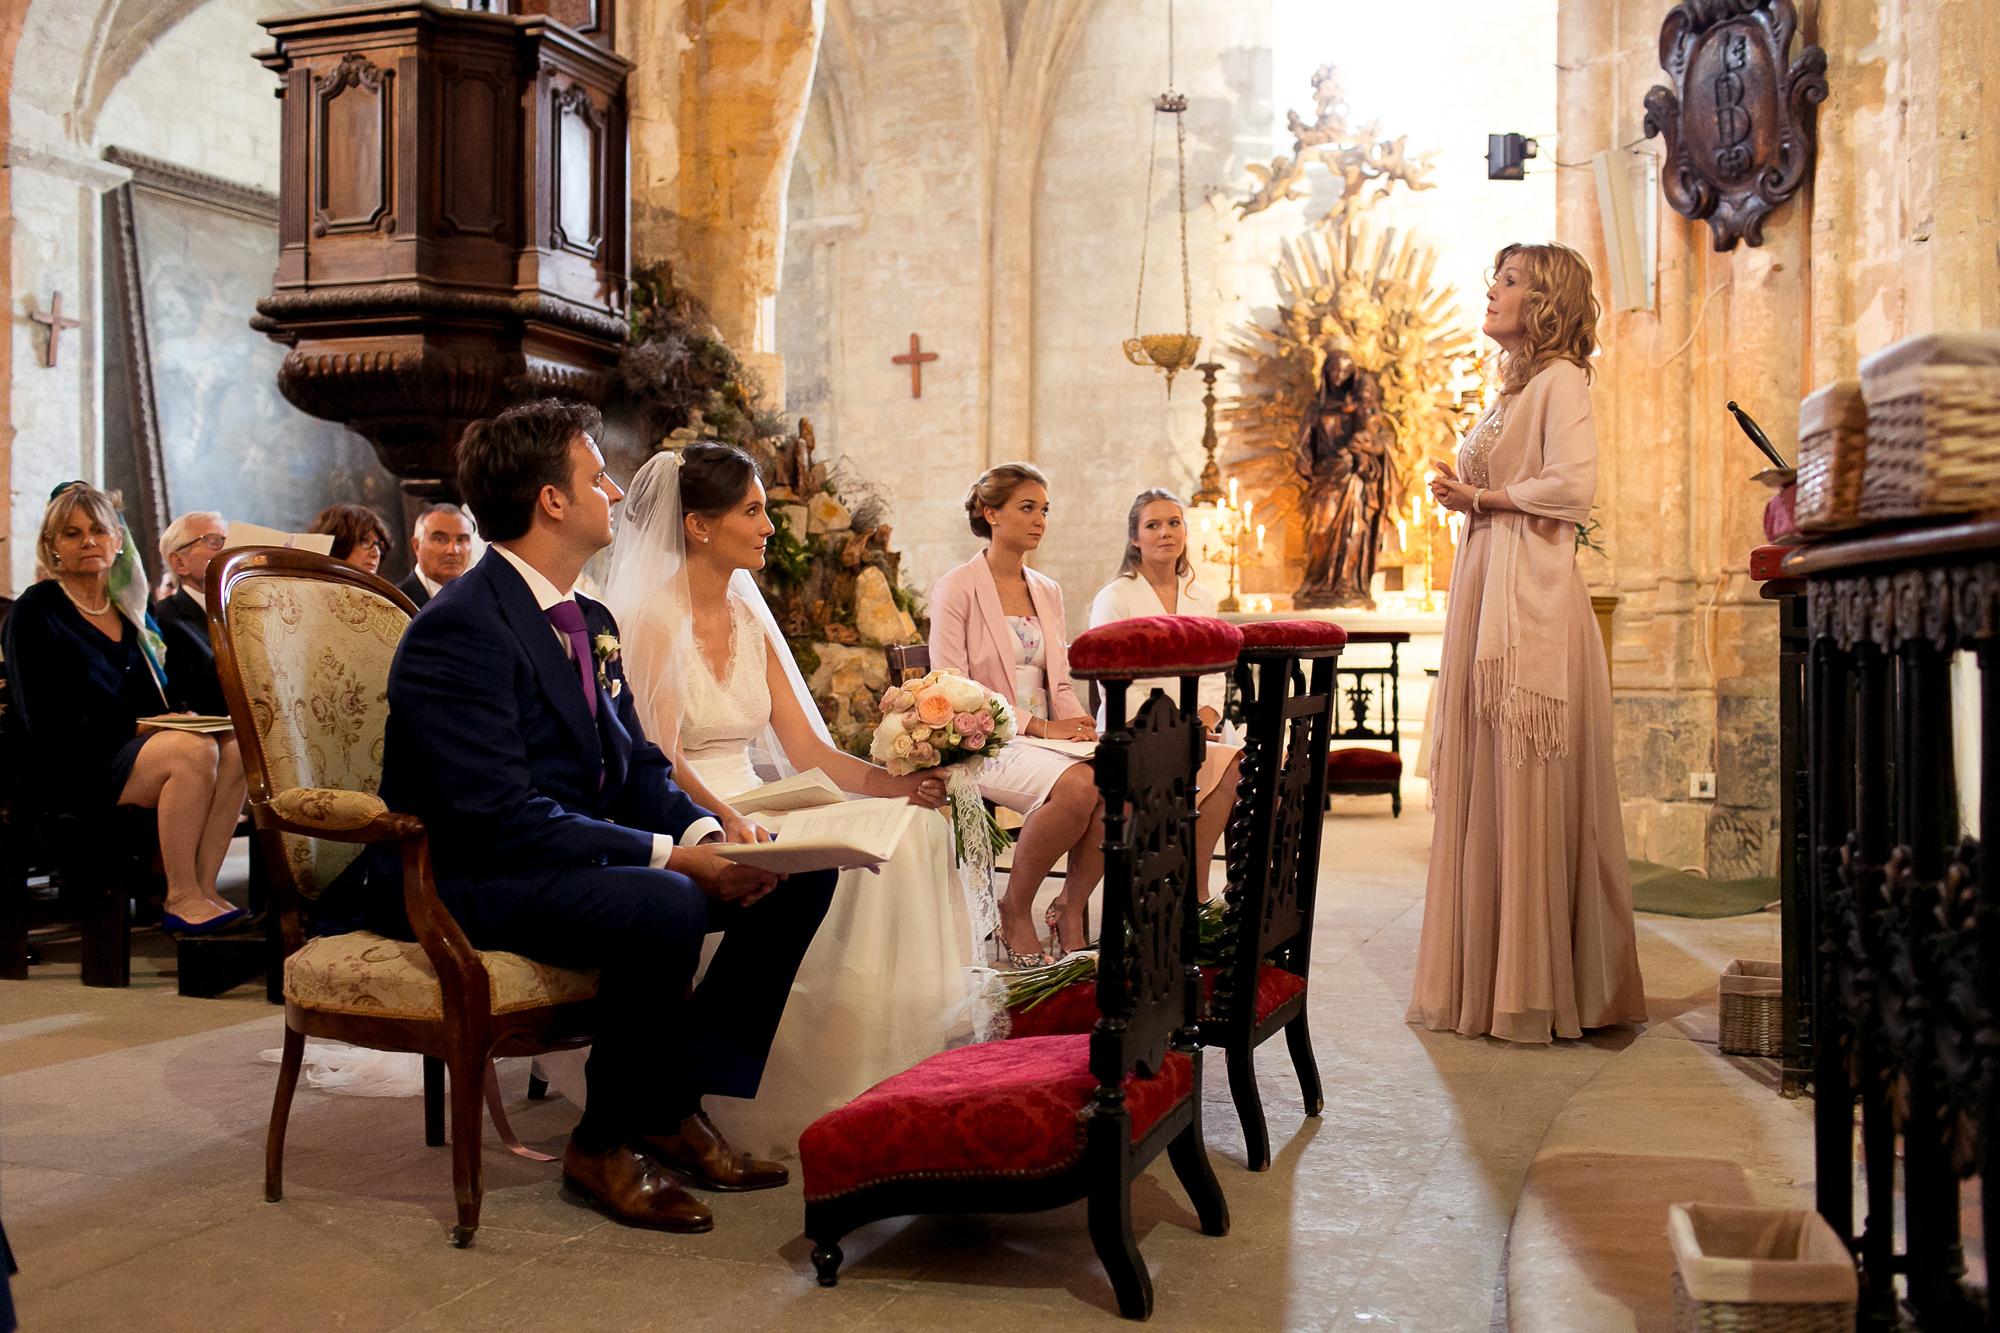 chanteuse messe mariage ariane douguet animation chant musique mariage eglise